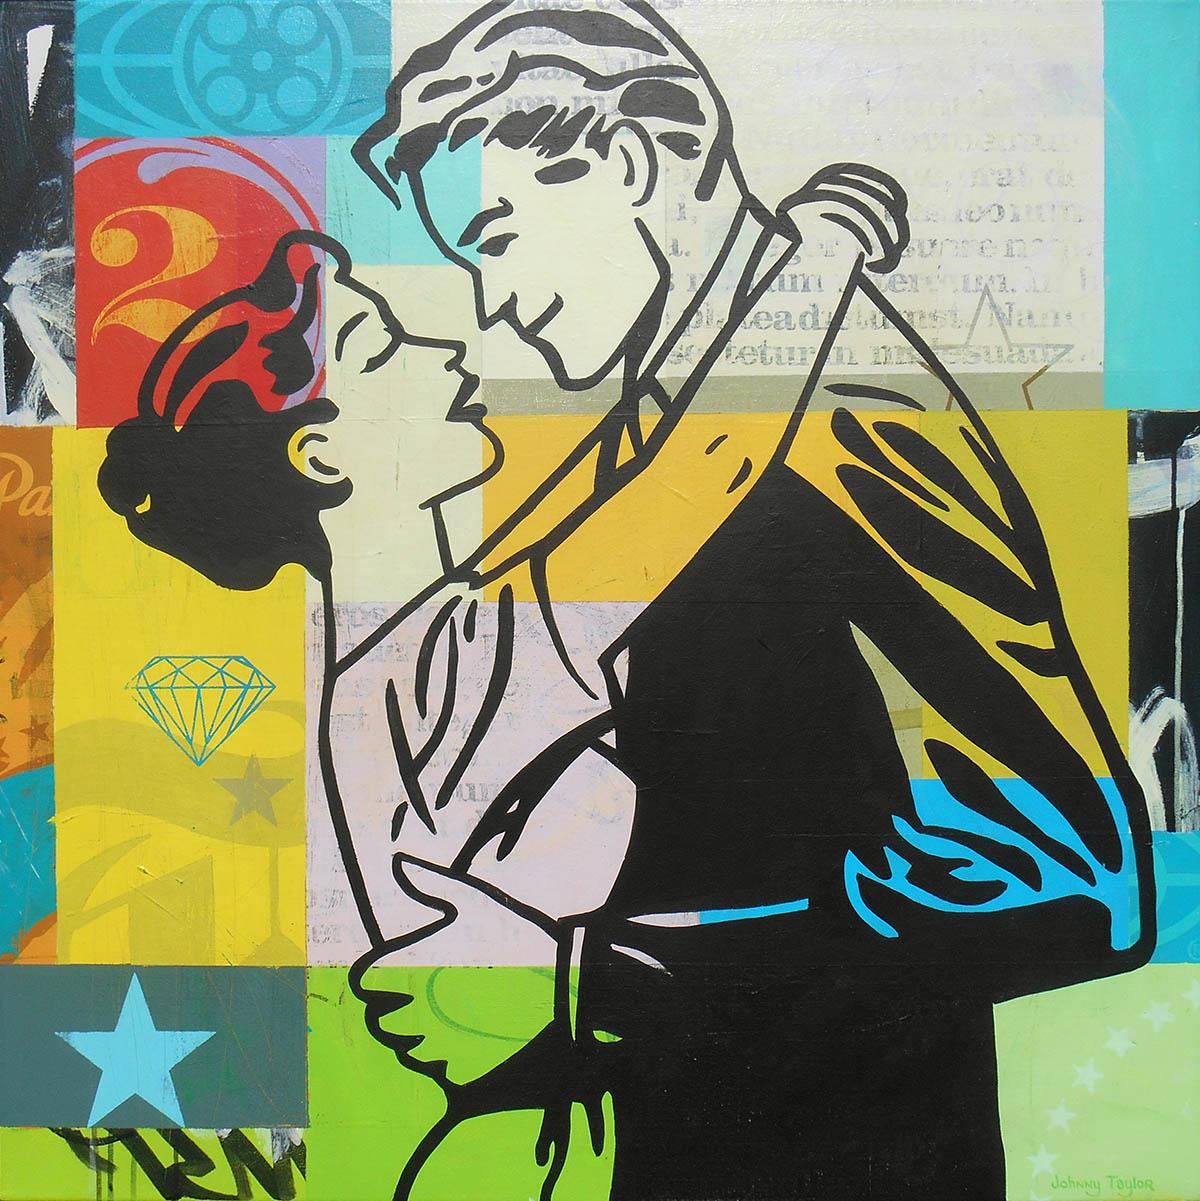 Pop art couple artwork by Johnny Taylor